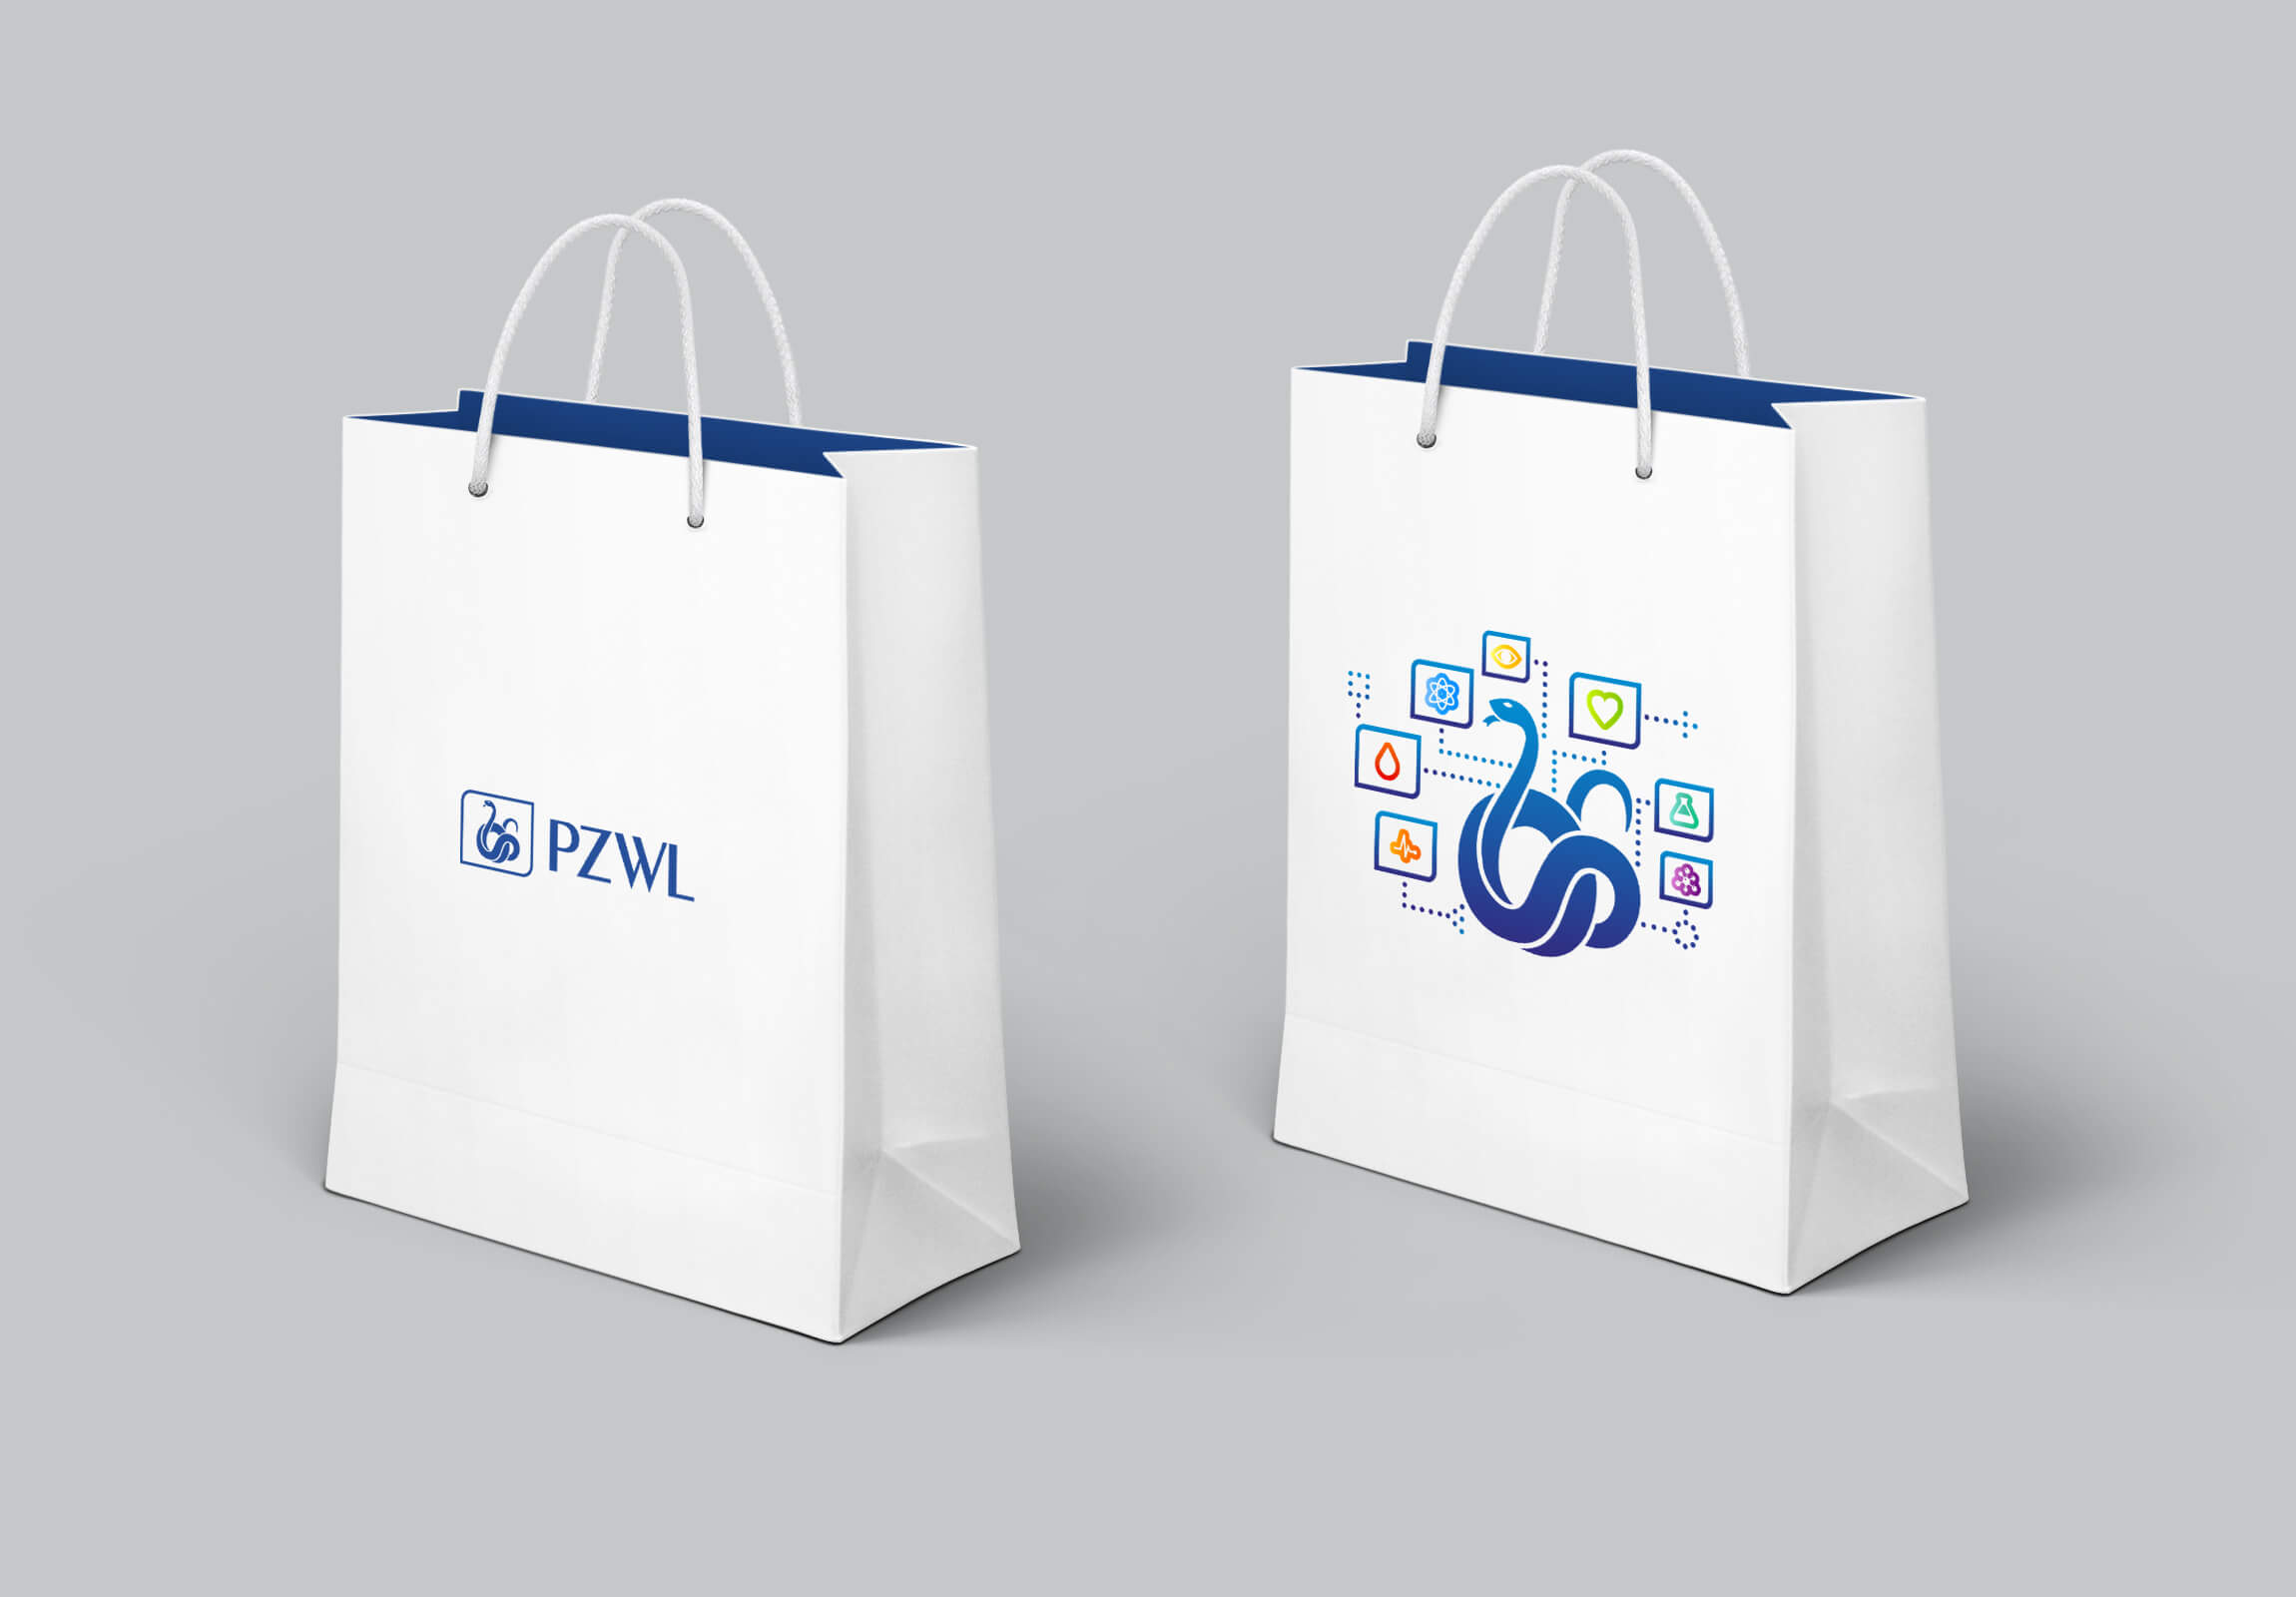 Graphic design example: corporate identity, promo bag